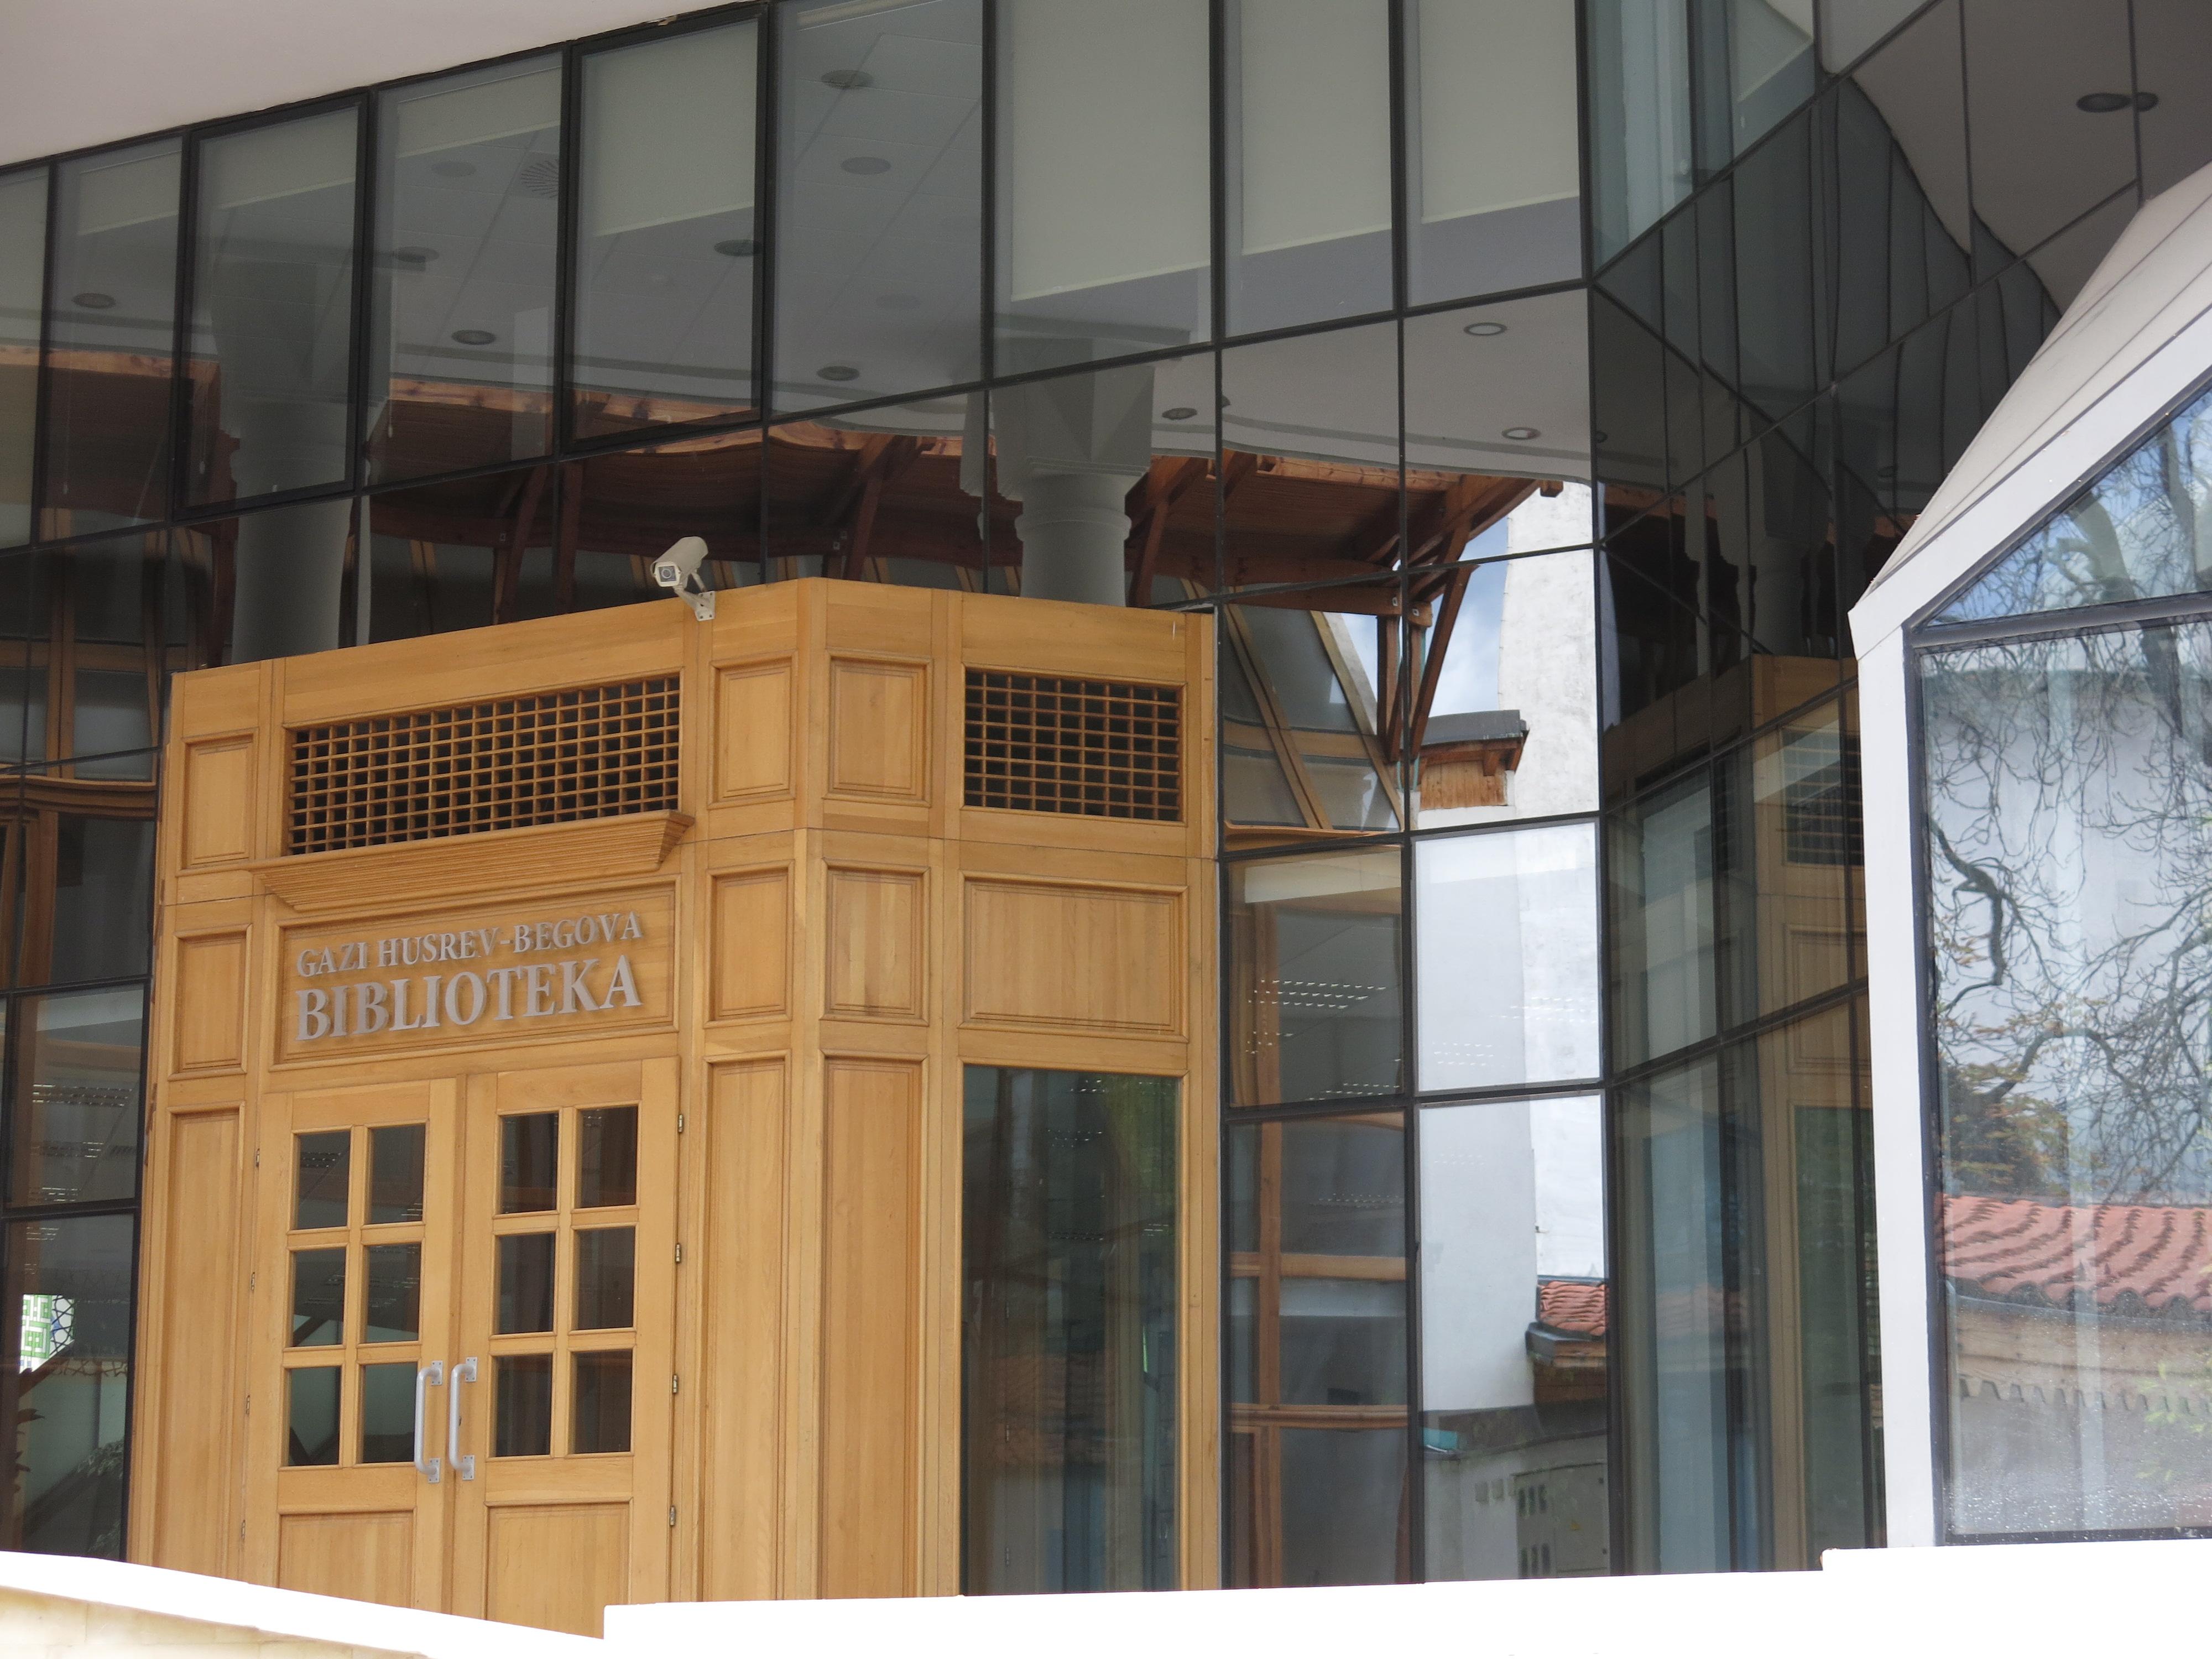 The entrance to Gazi Husrev Begova Library